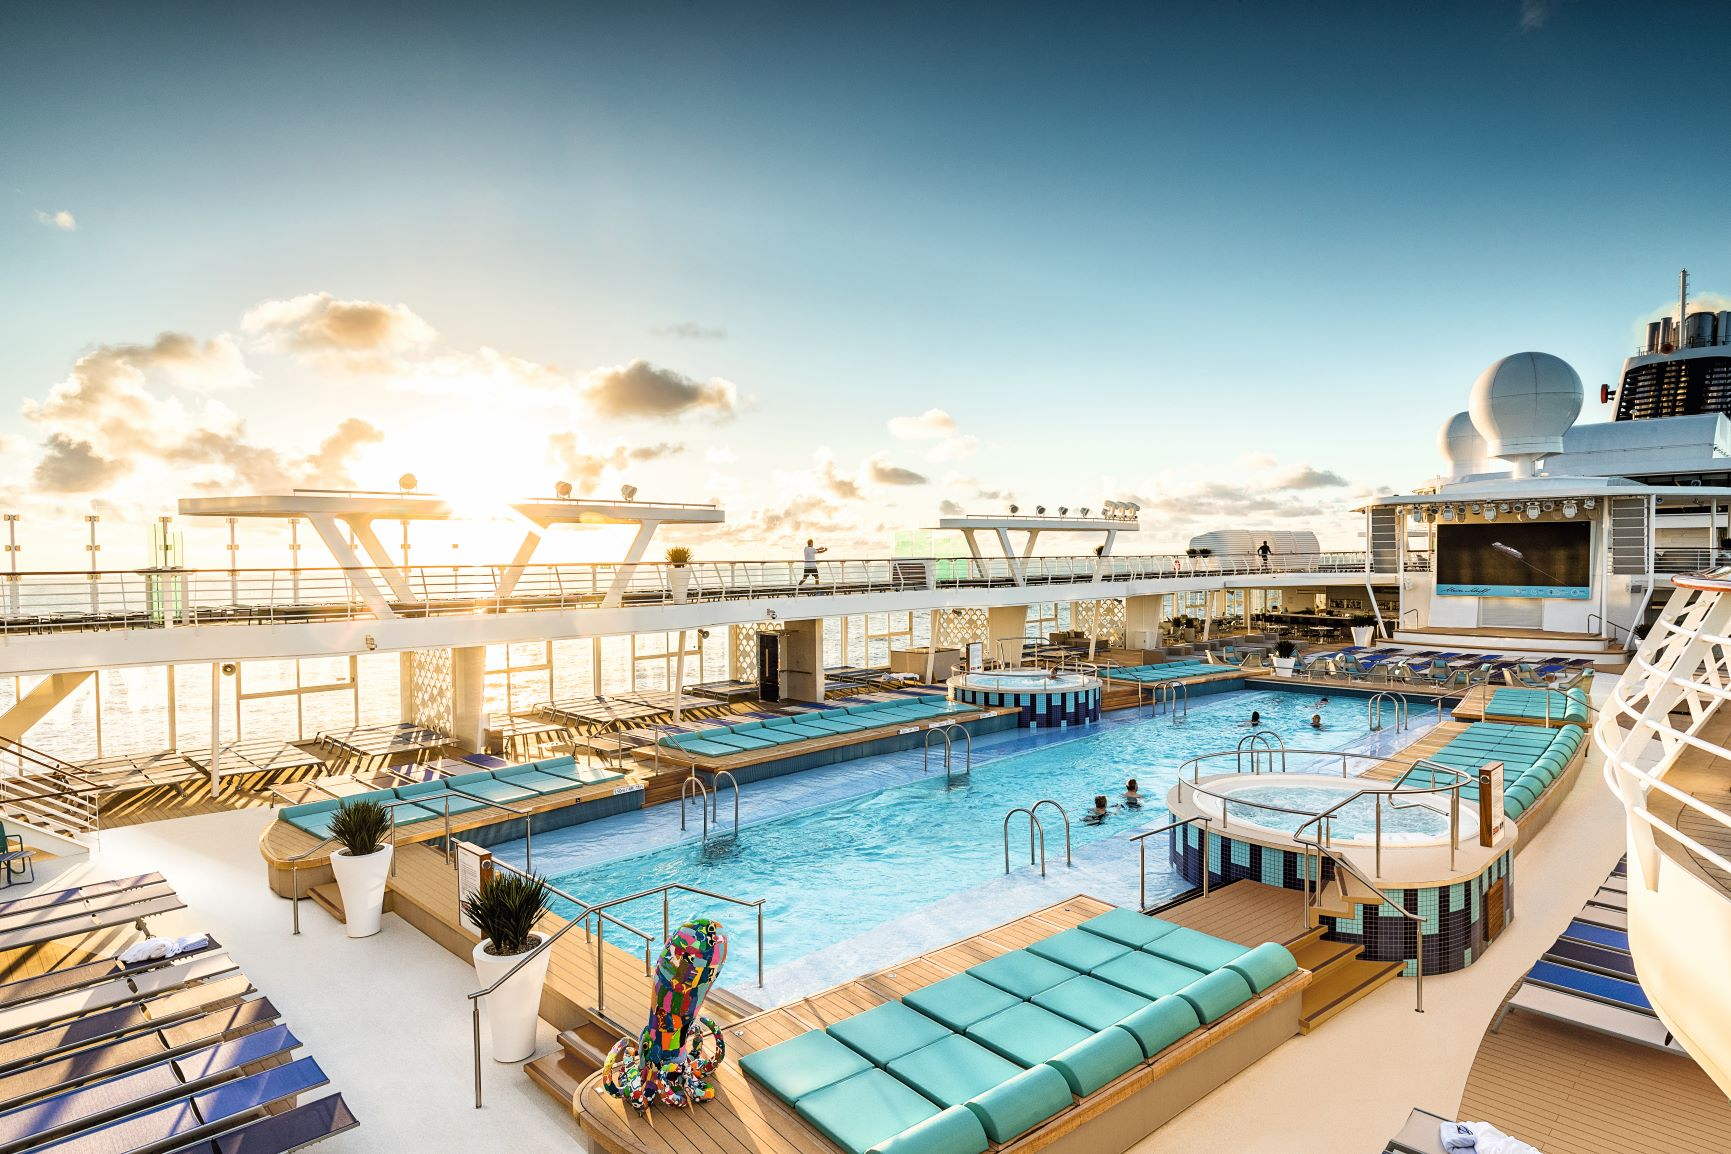 Mittelmeer Kreuzfahrt mit Ibiza